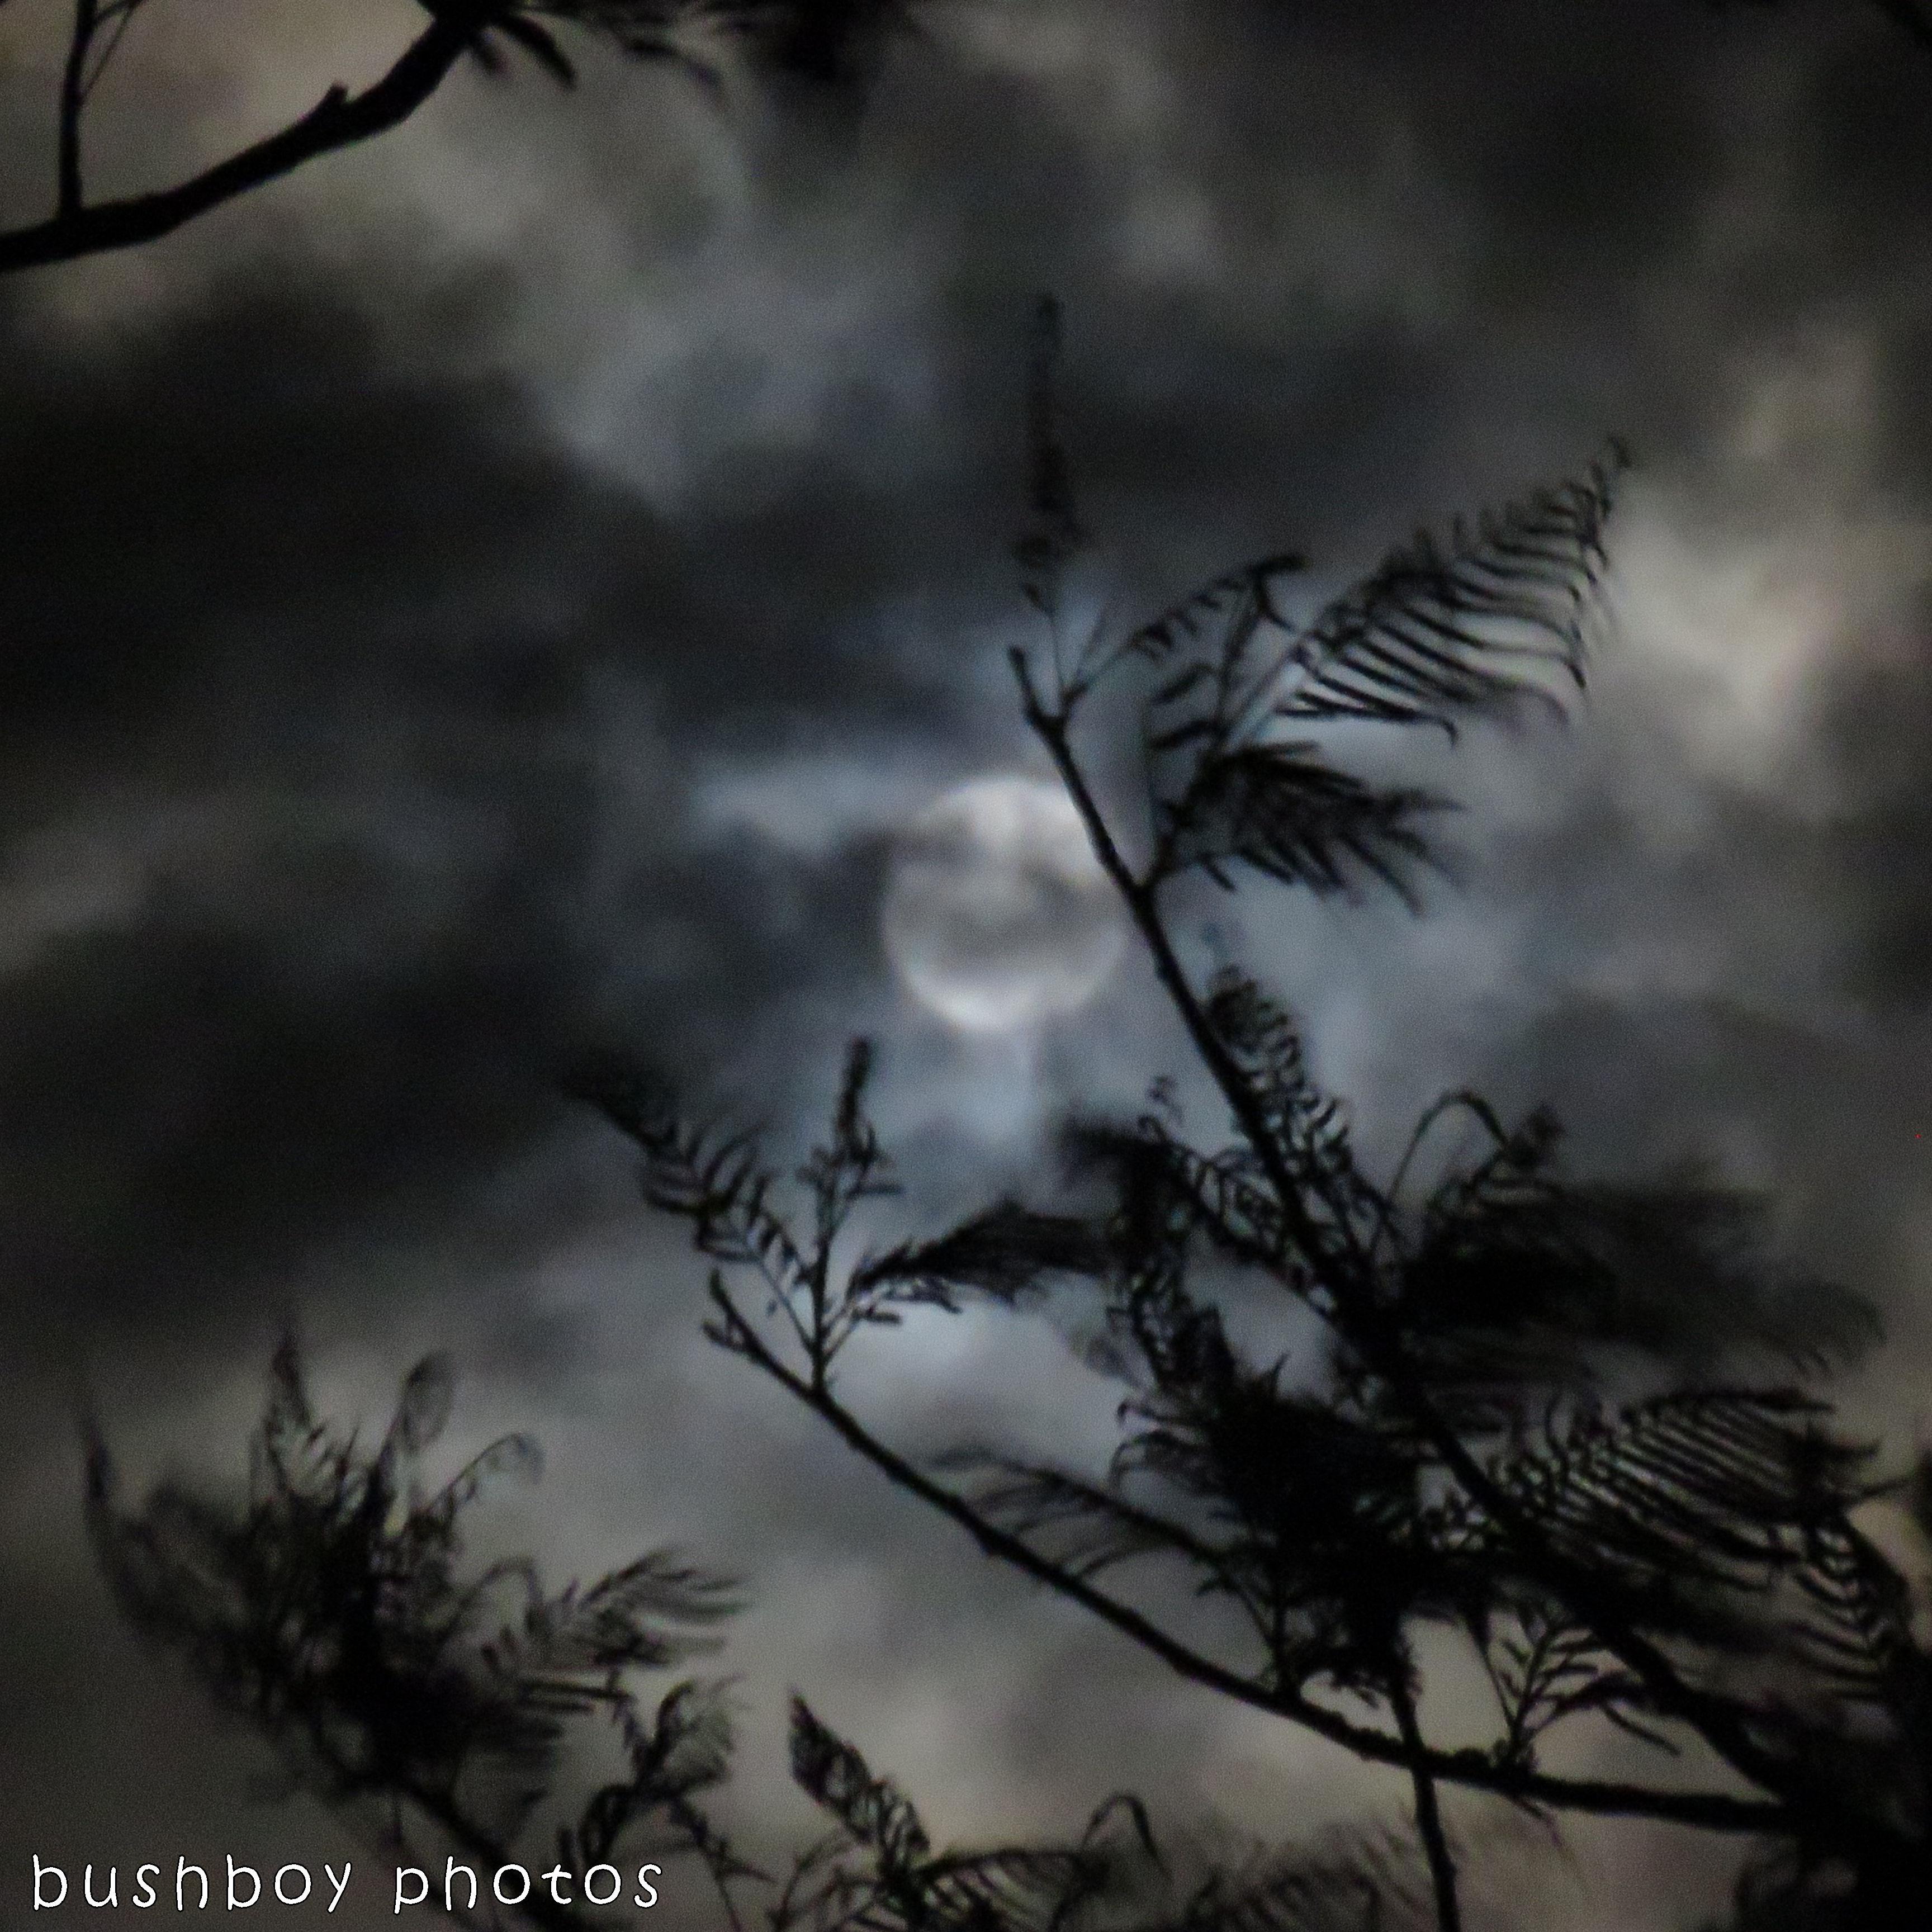 171205_blog challenge_squaresky_full moon